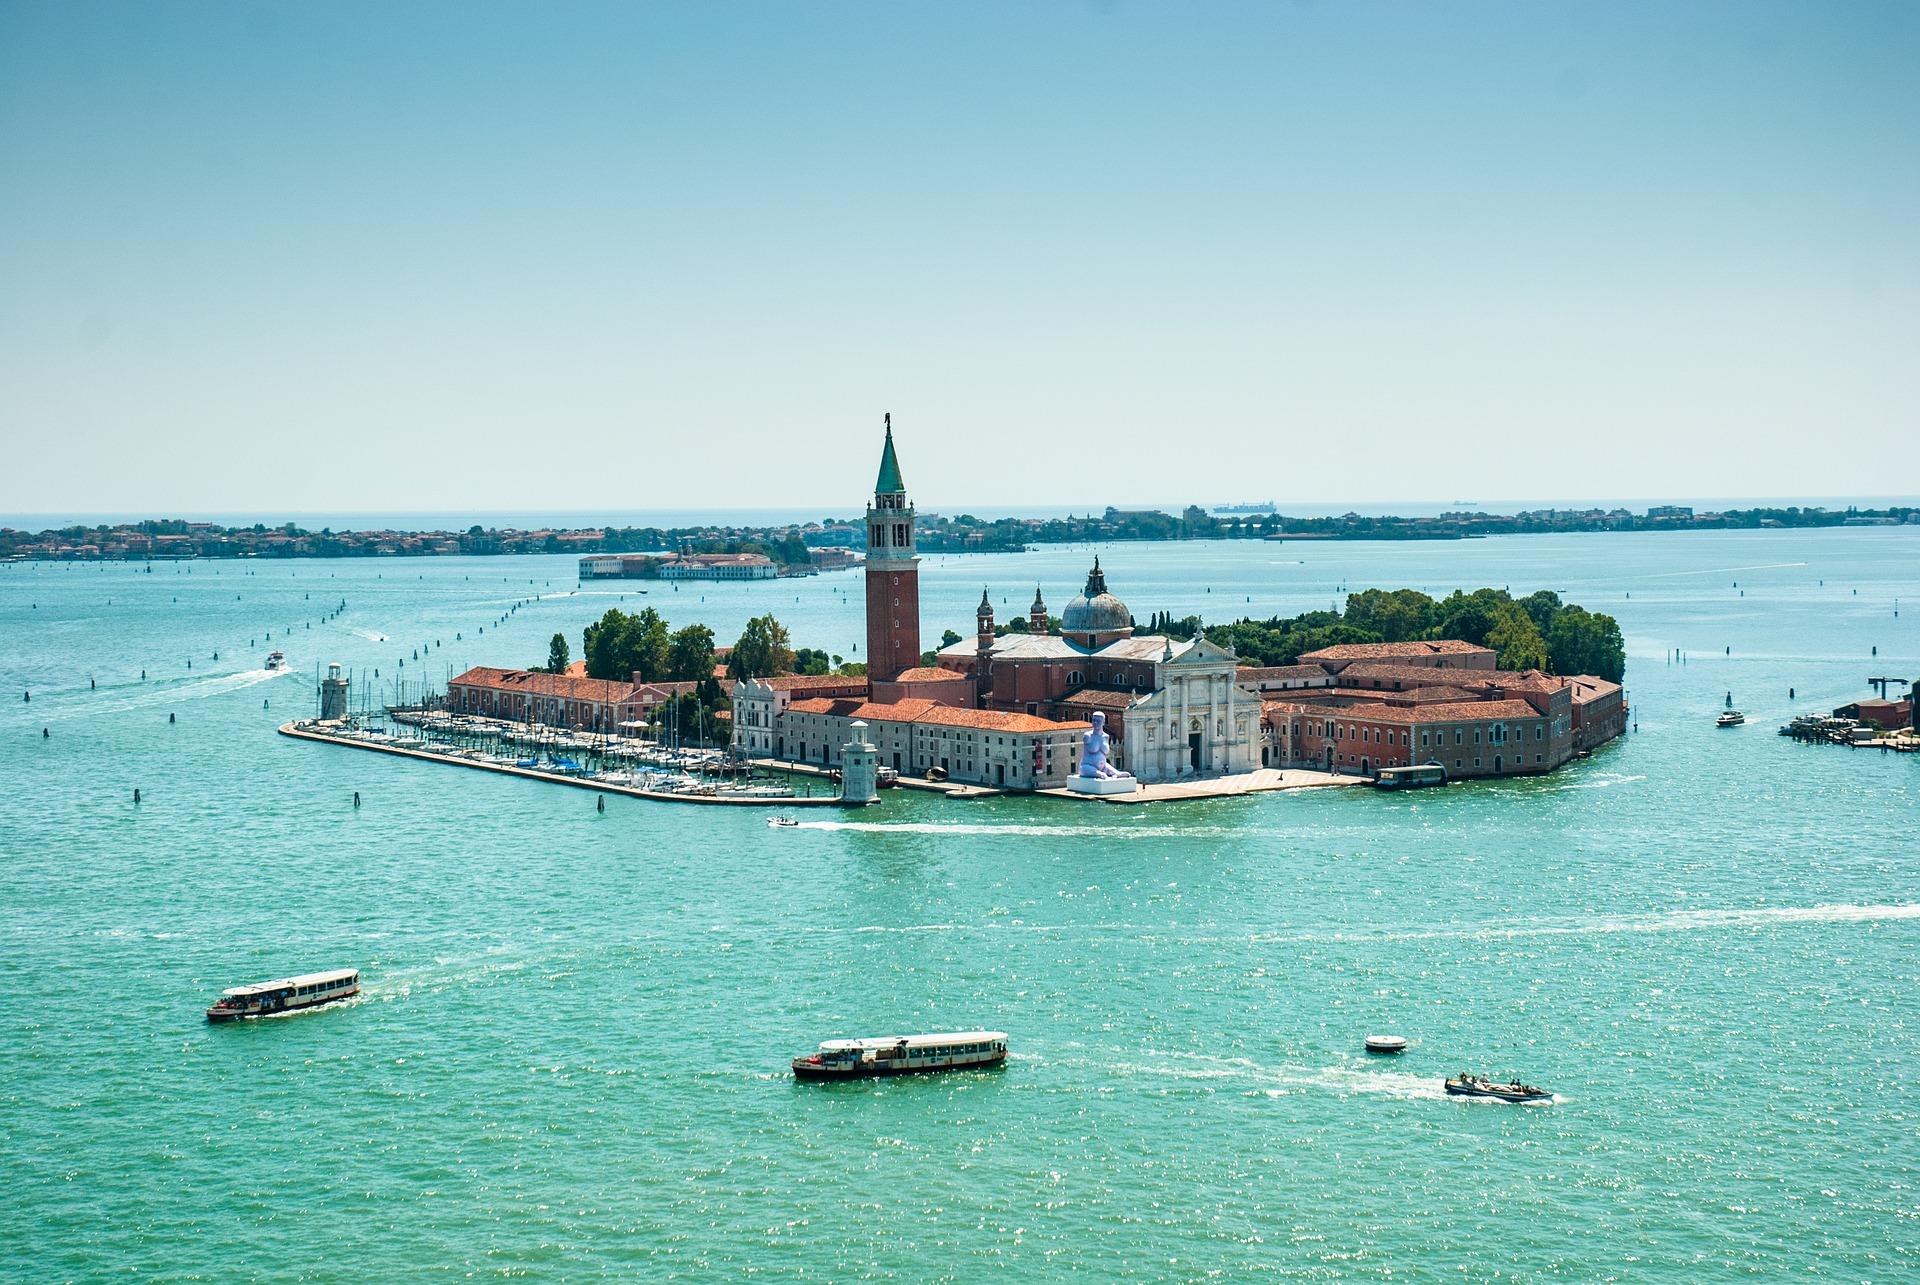 Murano Island in the Venetian Lagoon,Italy